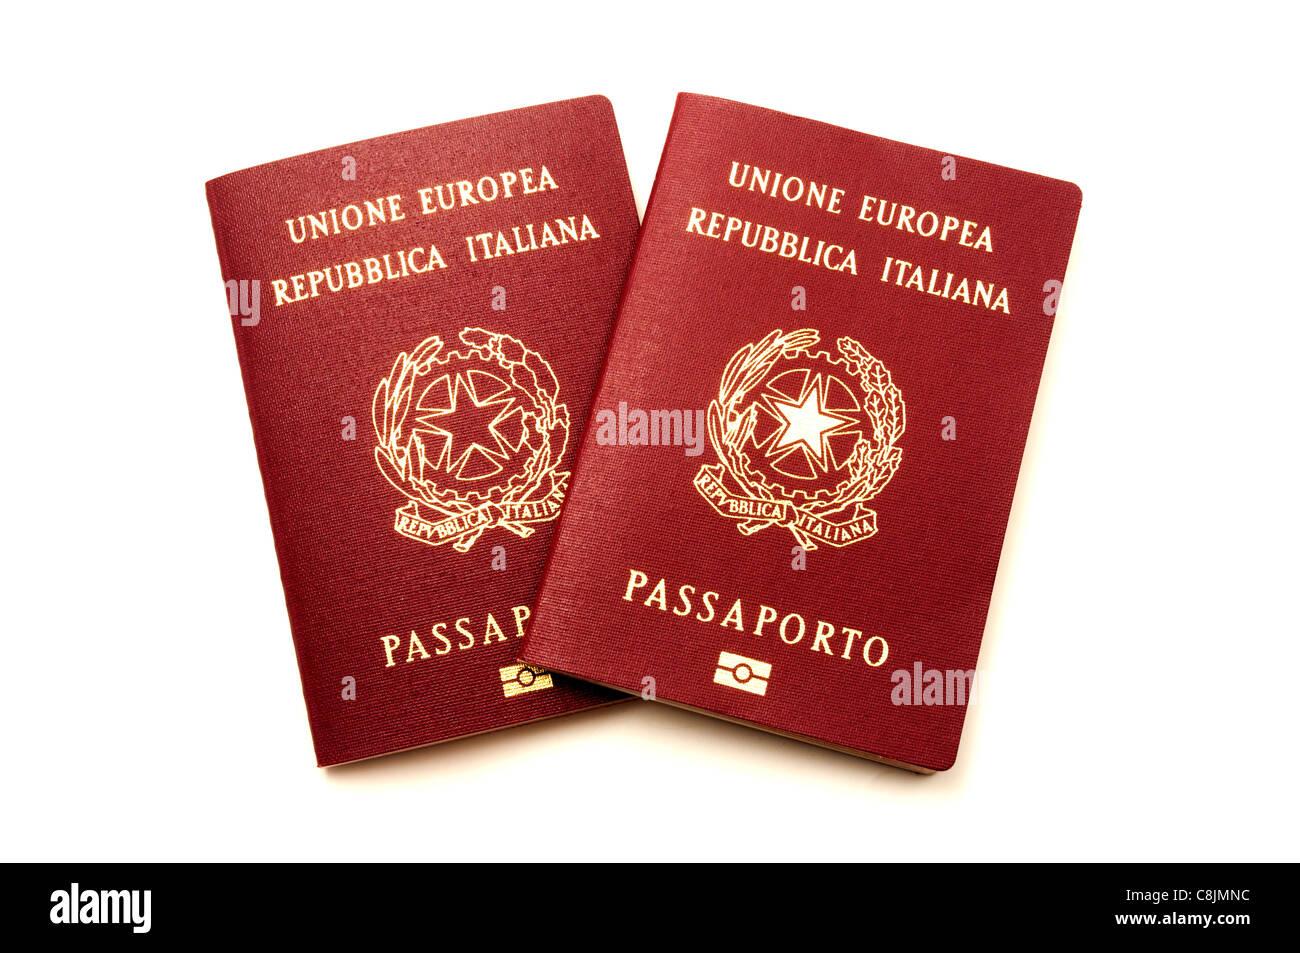 Italian biometric e-passports on a white background - Stock Image